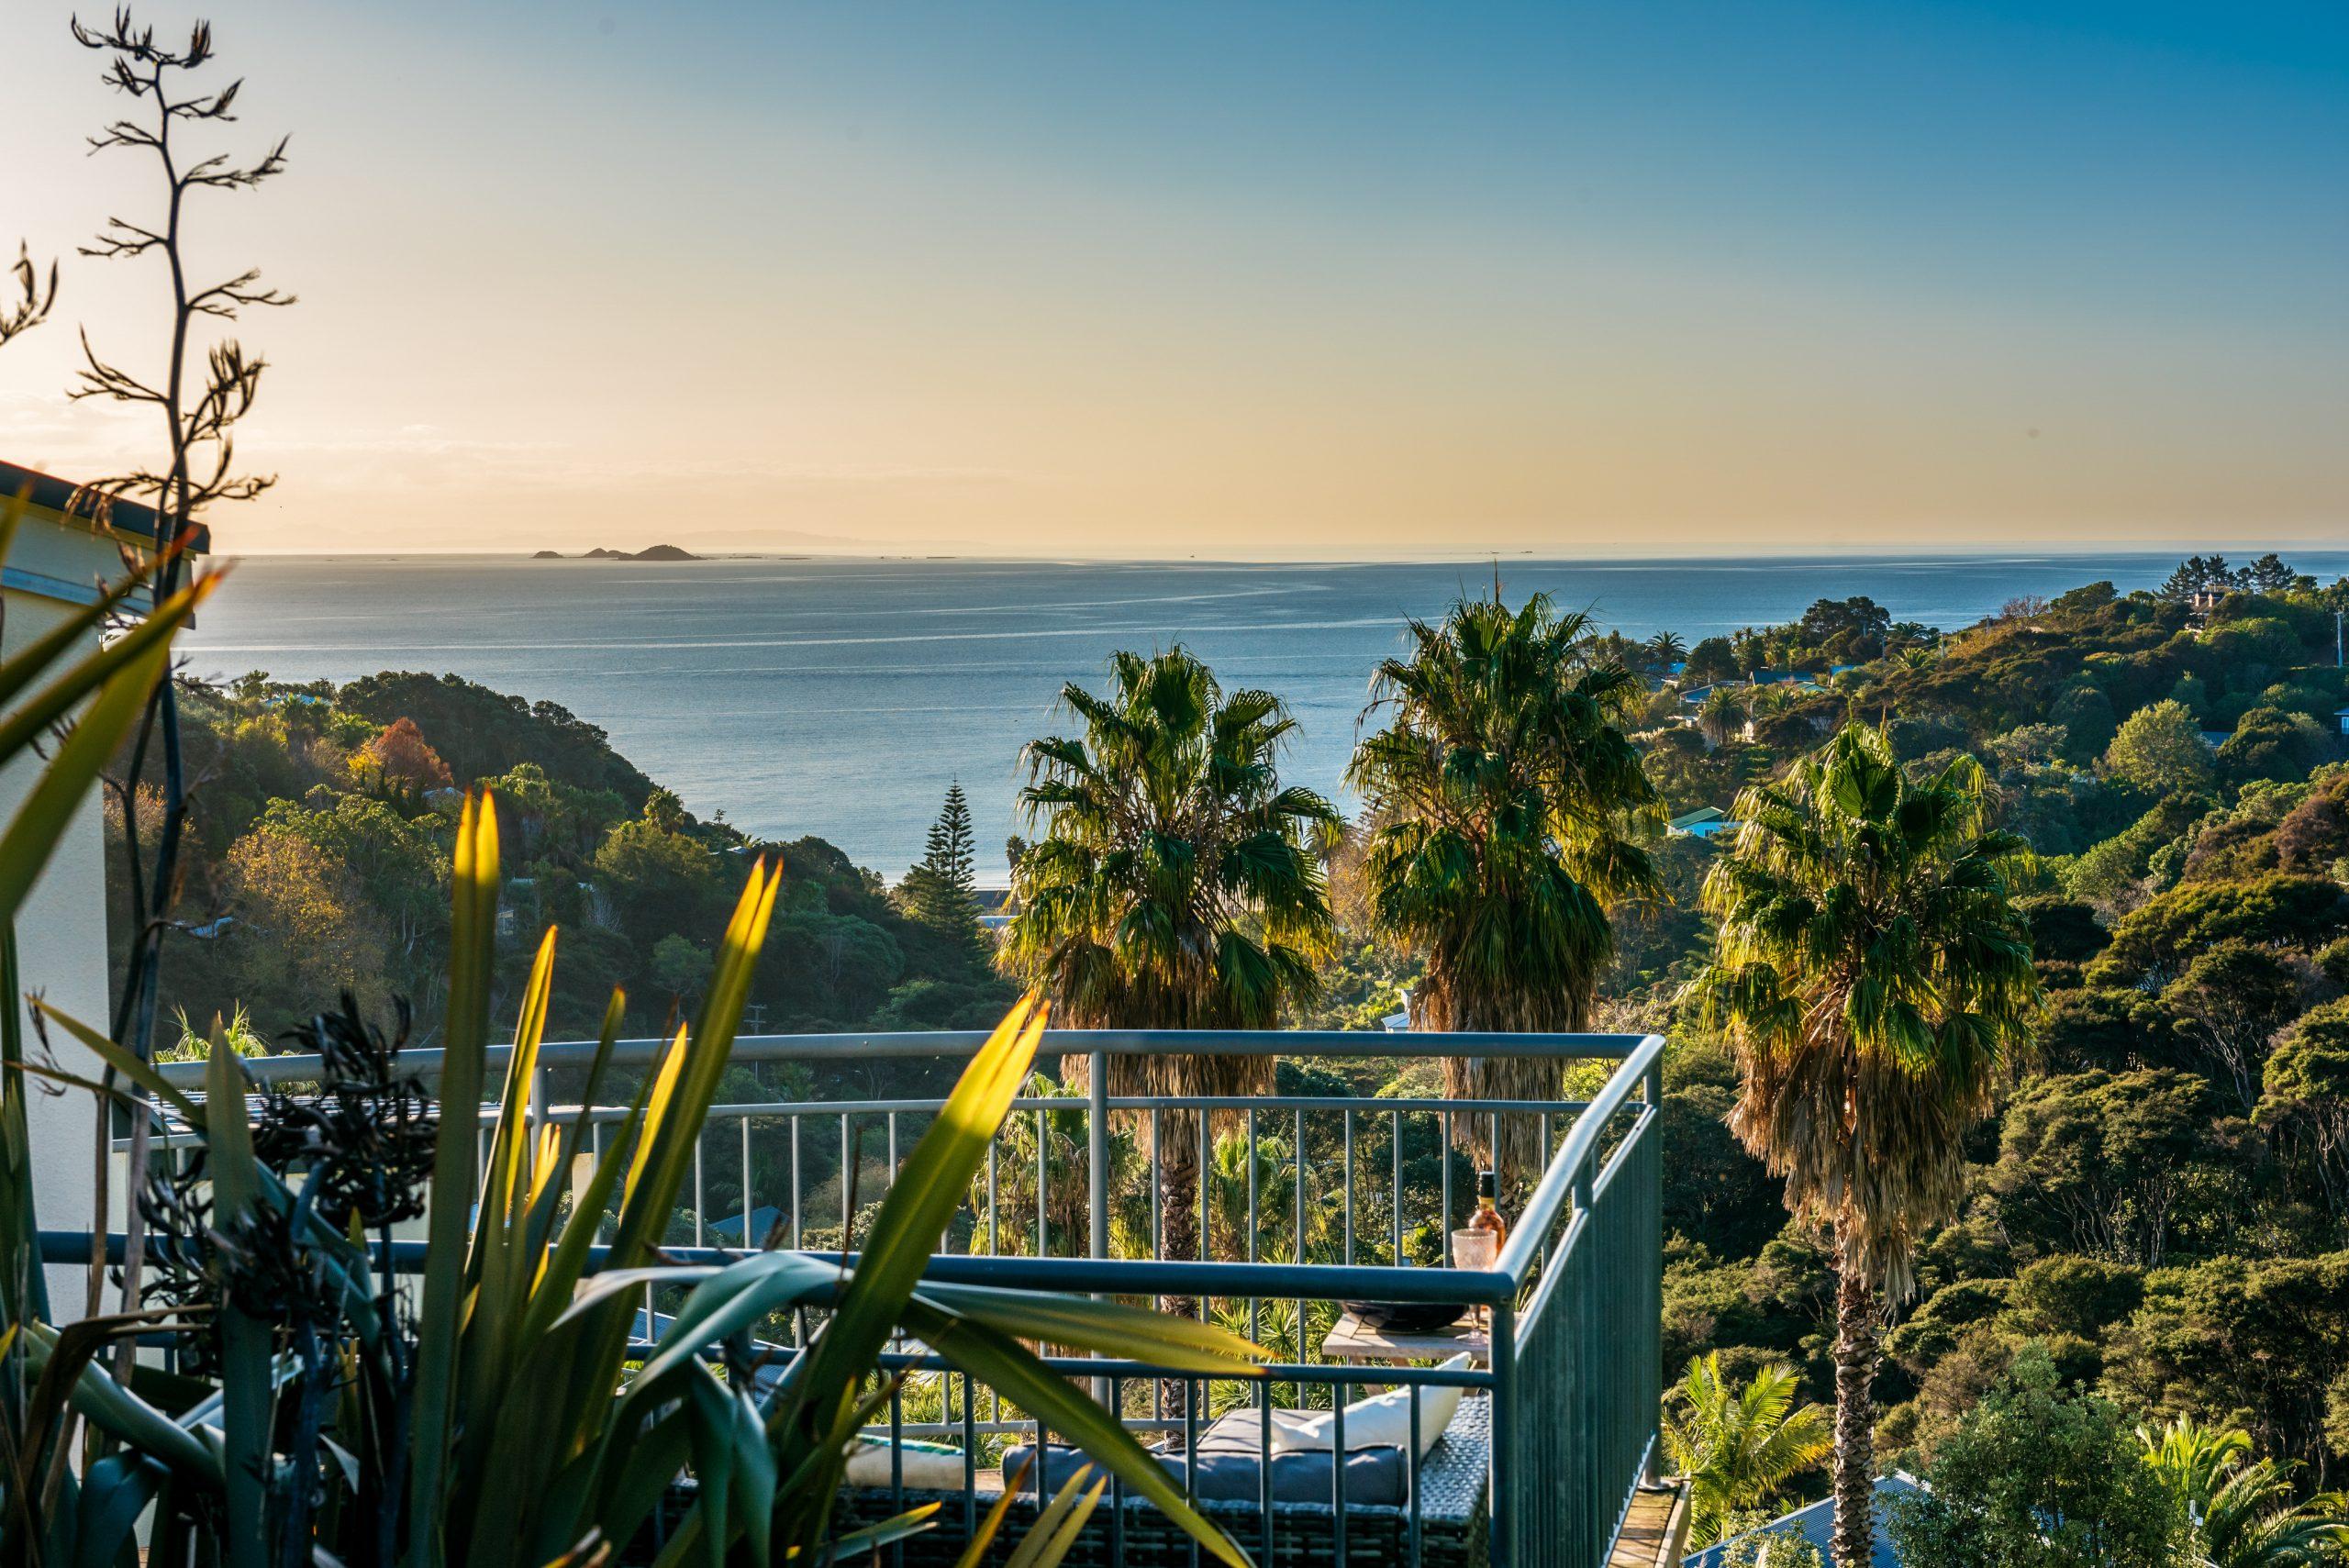 Villa Moana 2,  Palm Beach - Stay 3, Pay 2 Winter Promo